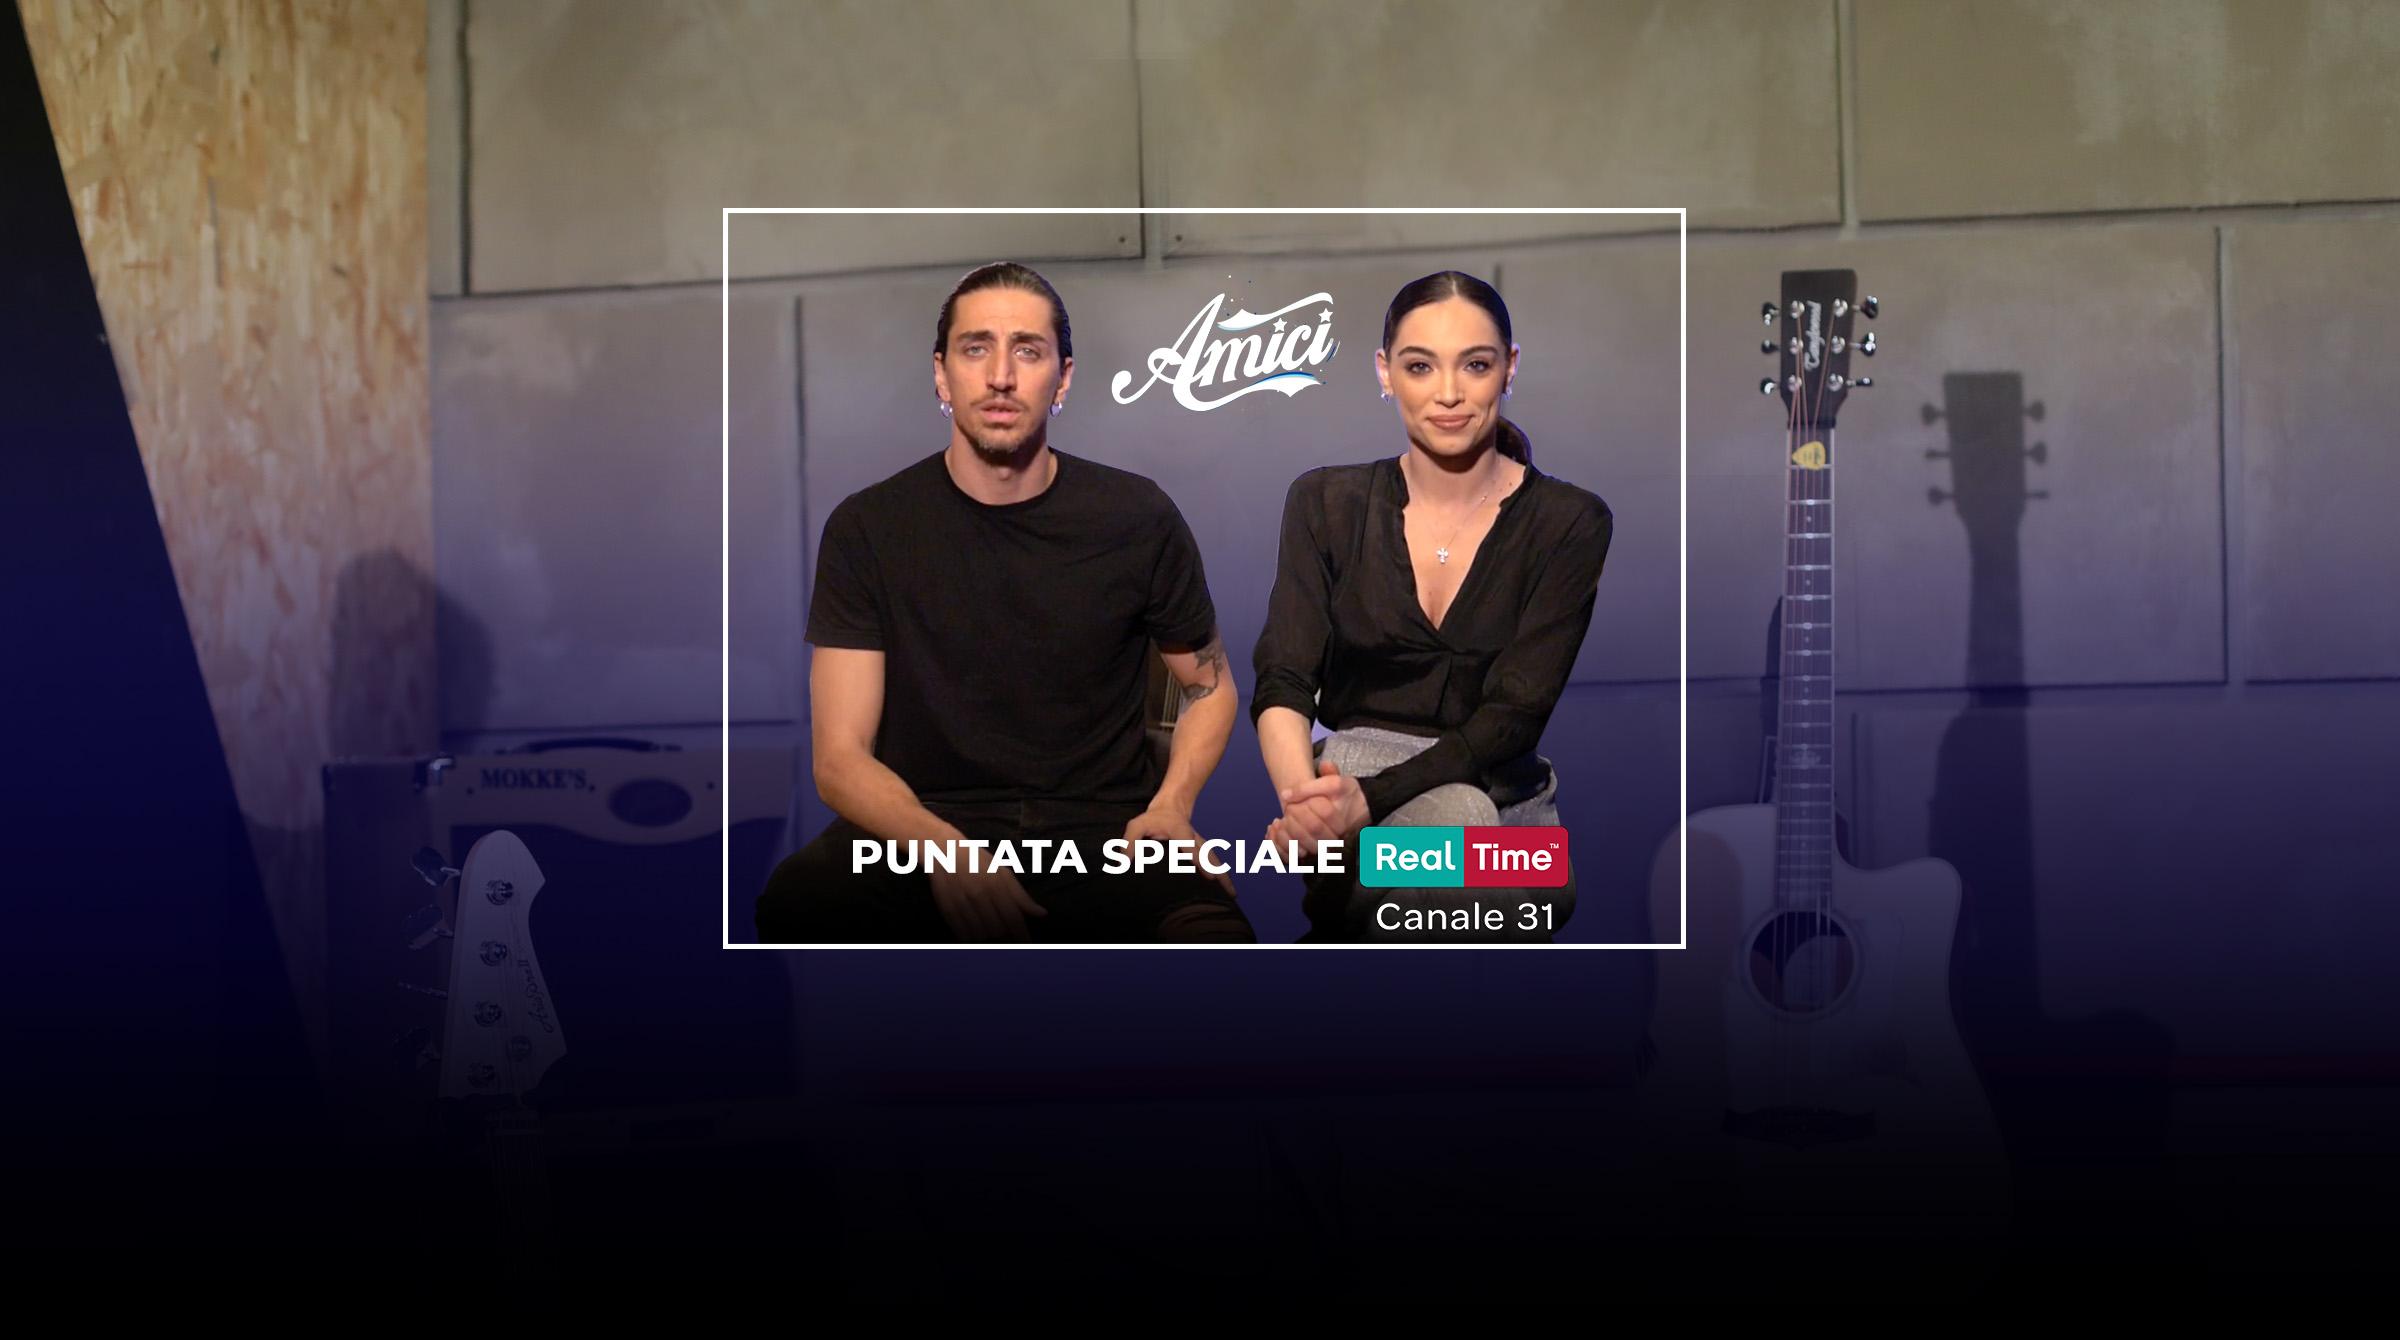 puntataspeciale-realtime-amici19